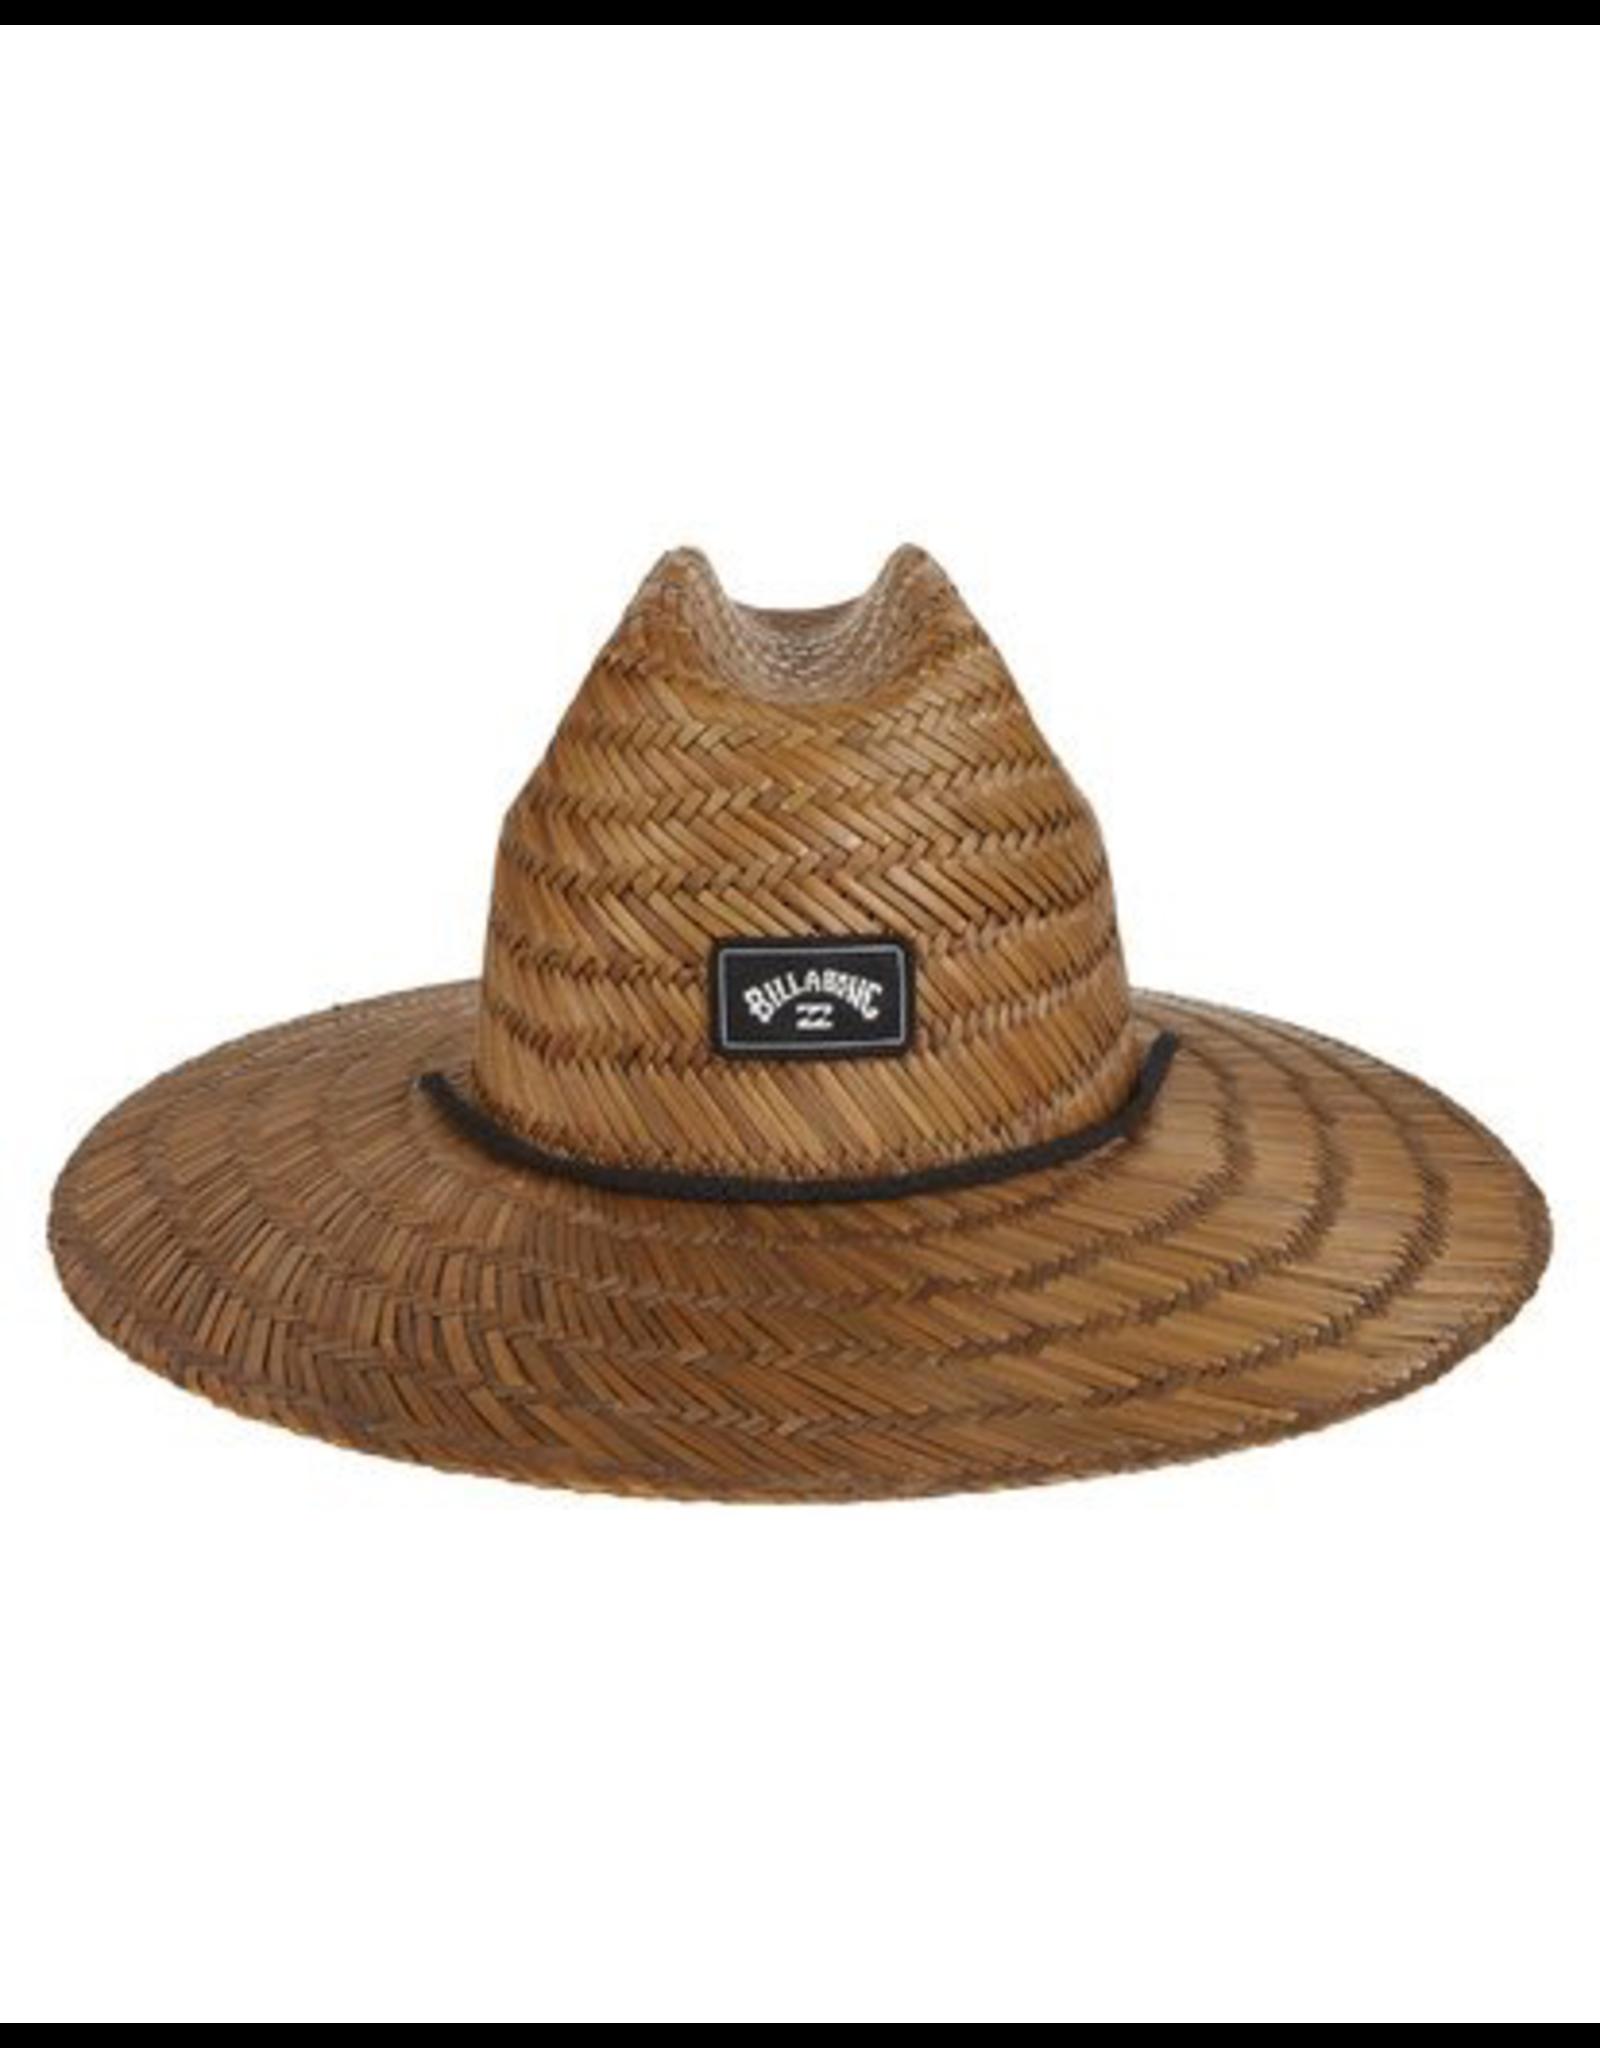 BILLABONG TIDES STRAW LIFEGUARD HAT